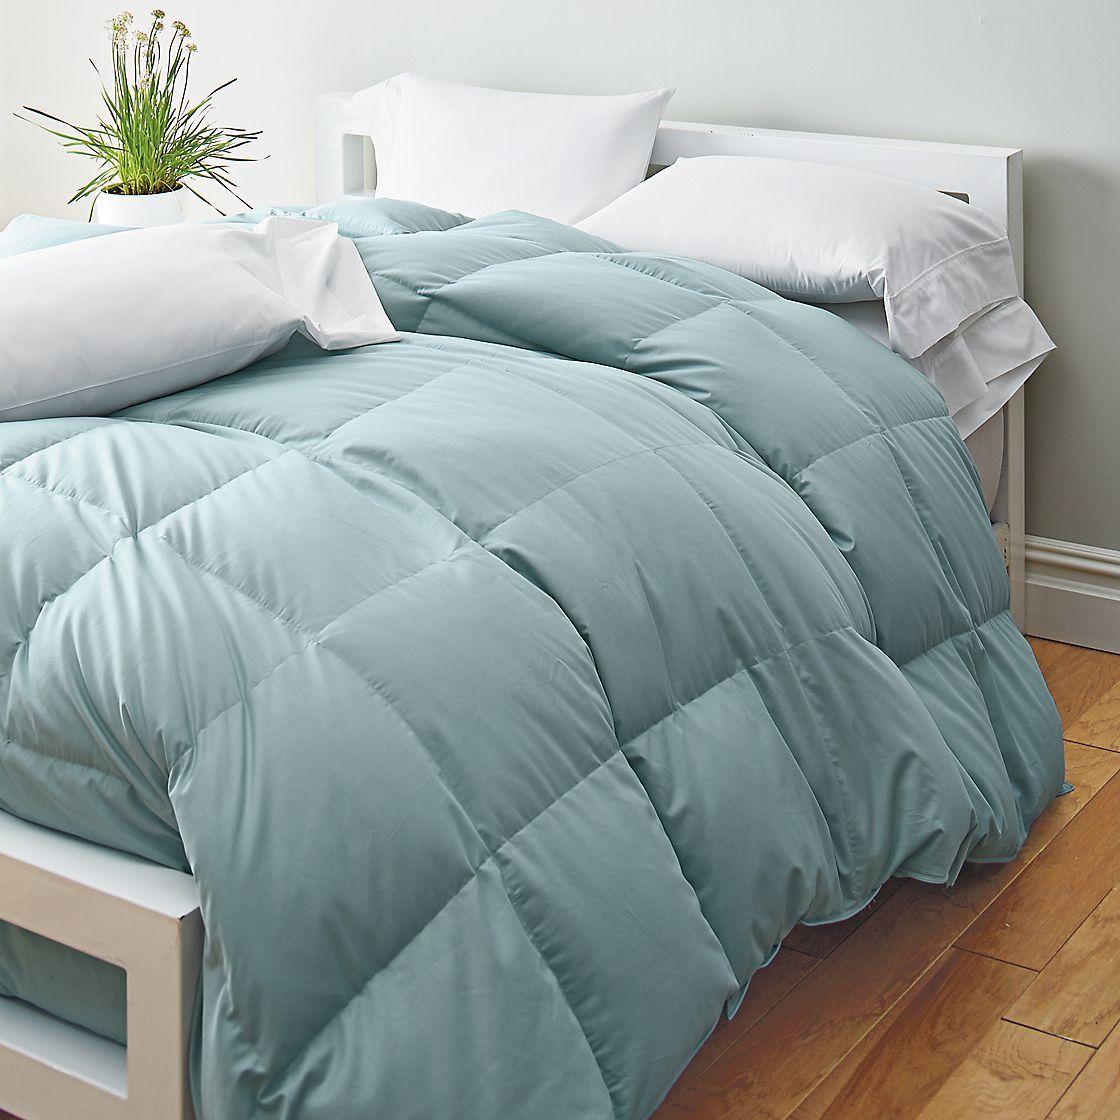 Down Vs Alternative Comforter House Comforters